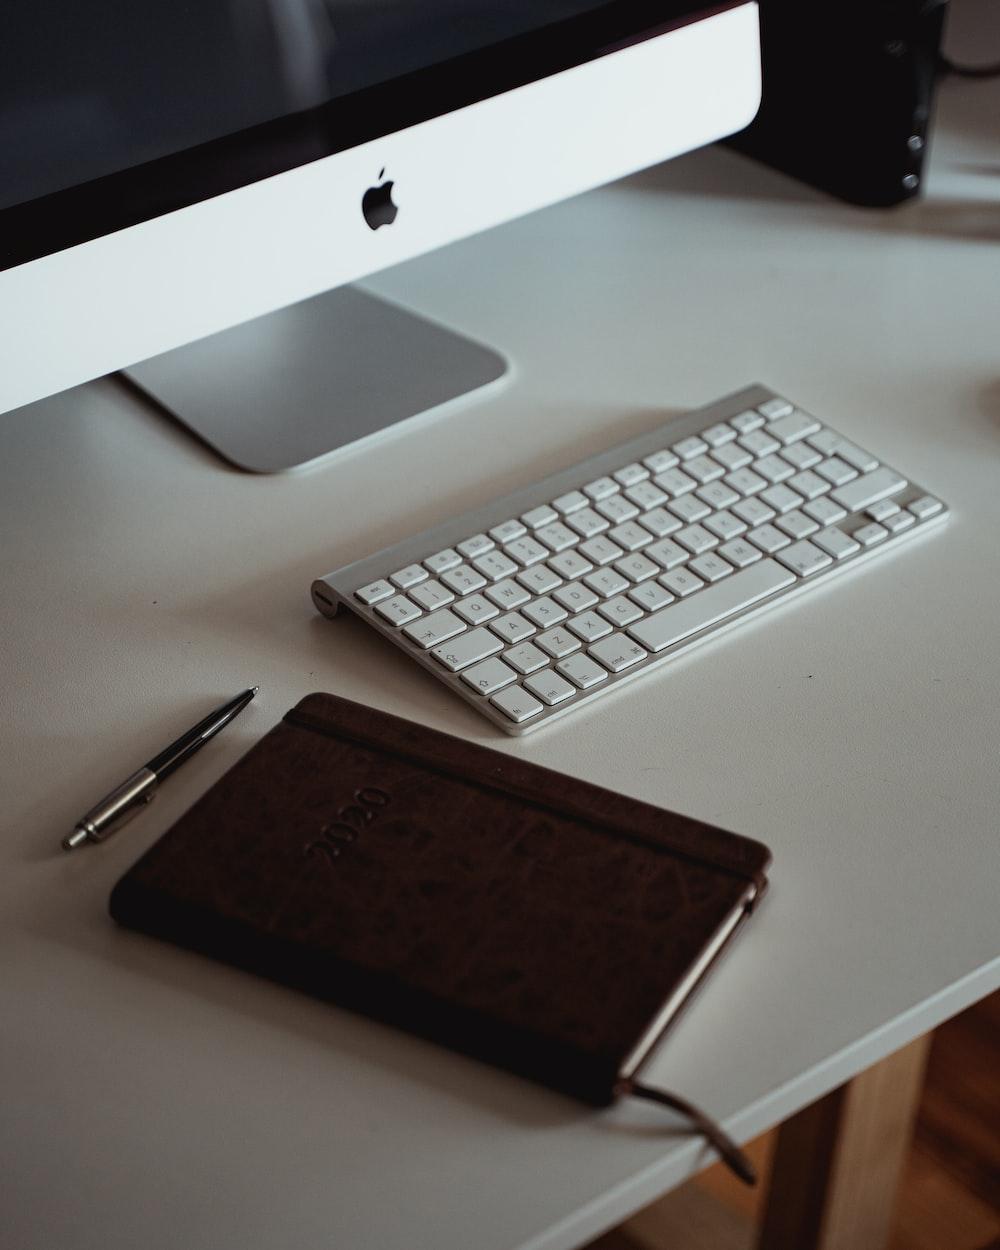 silver imac and apple keyboard